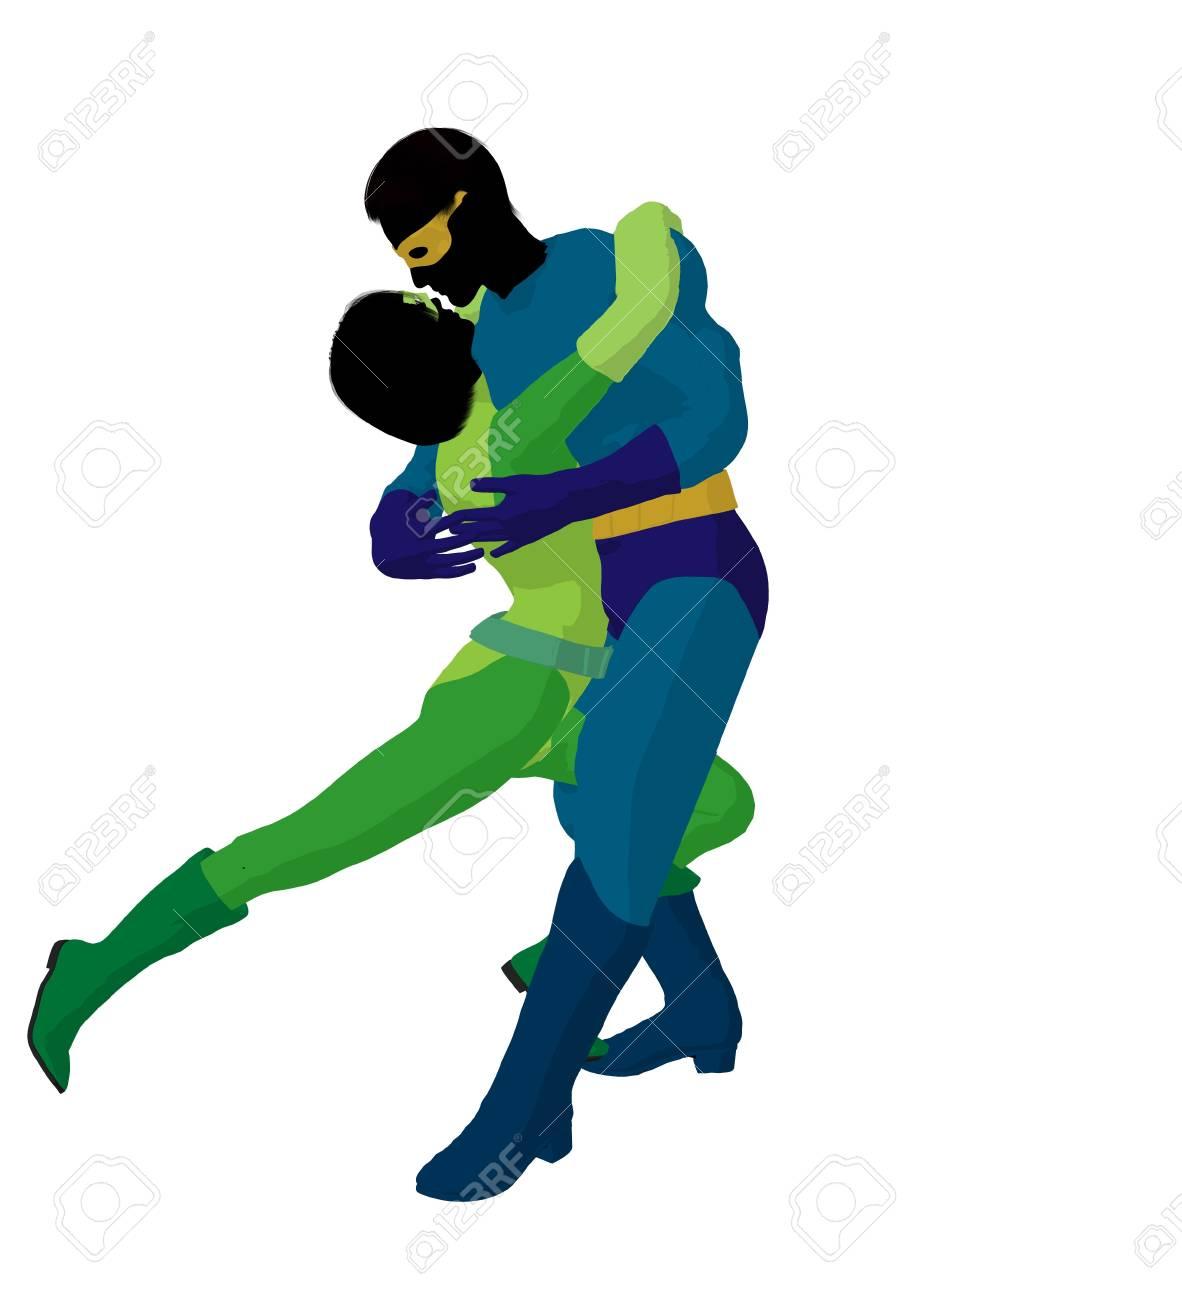 hero couple silhouette on a white background Stock Photo - 7942822